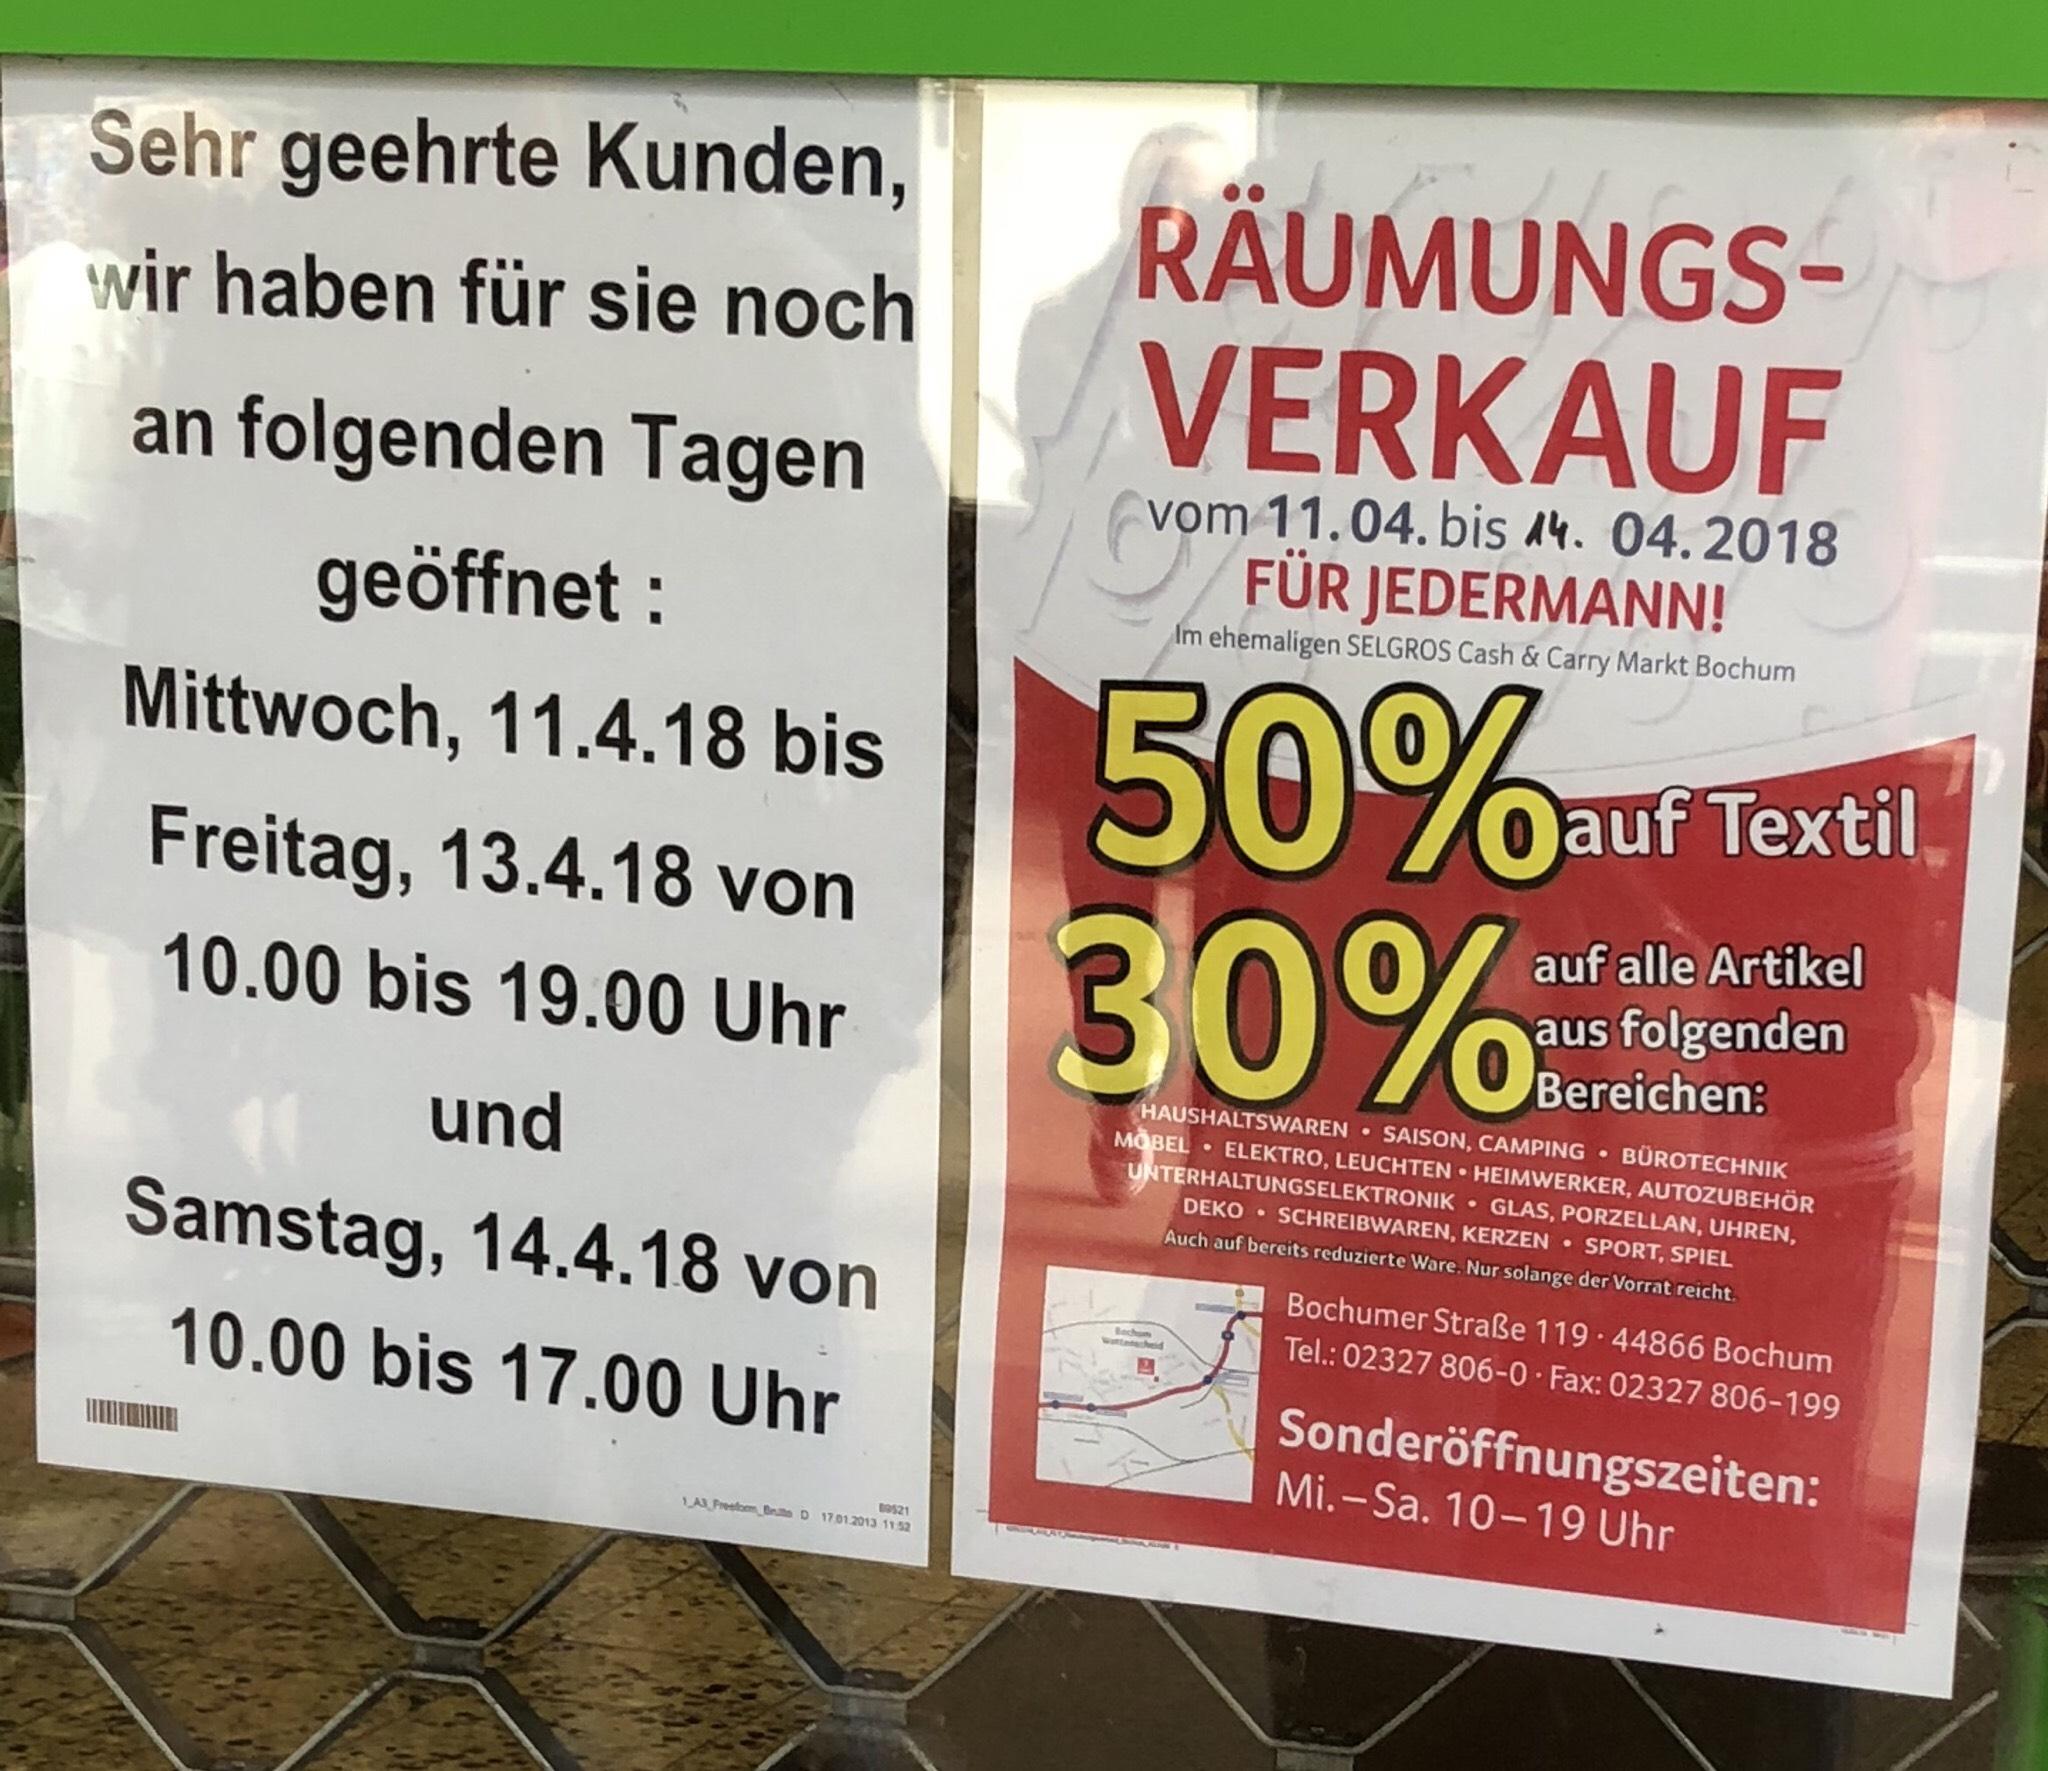 Räumungsverkauf Selgros Bochum ( Lokal )